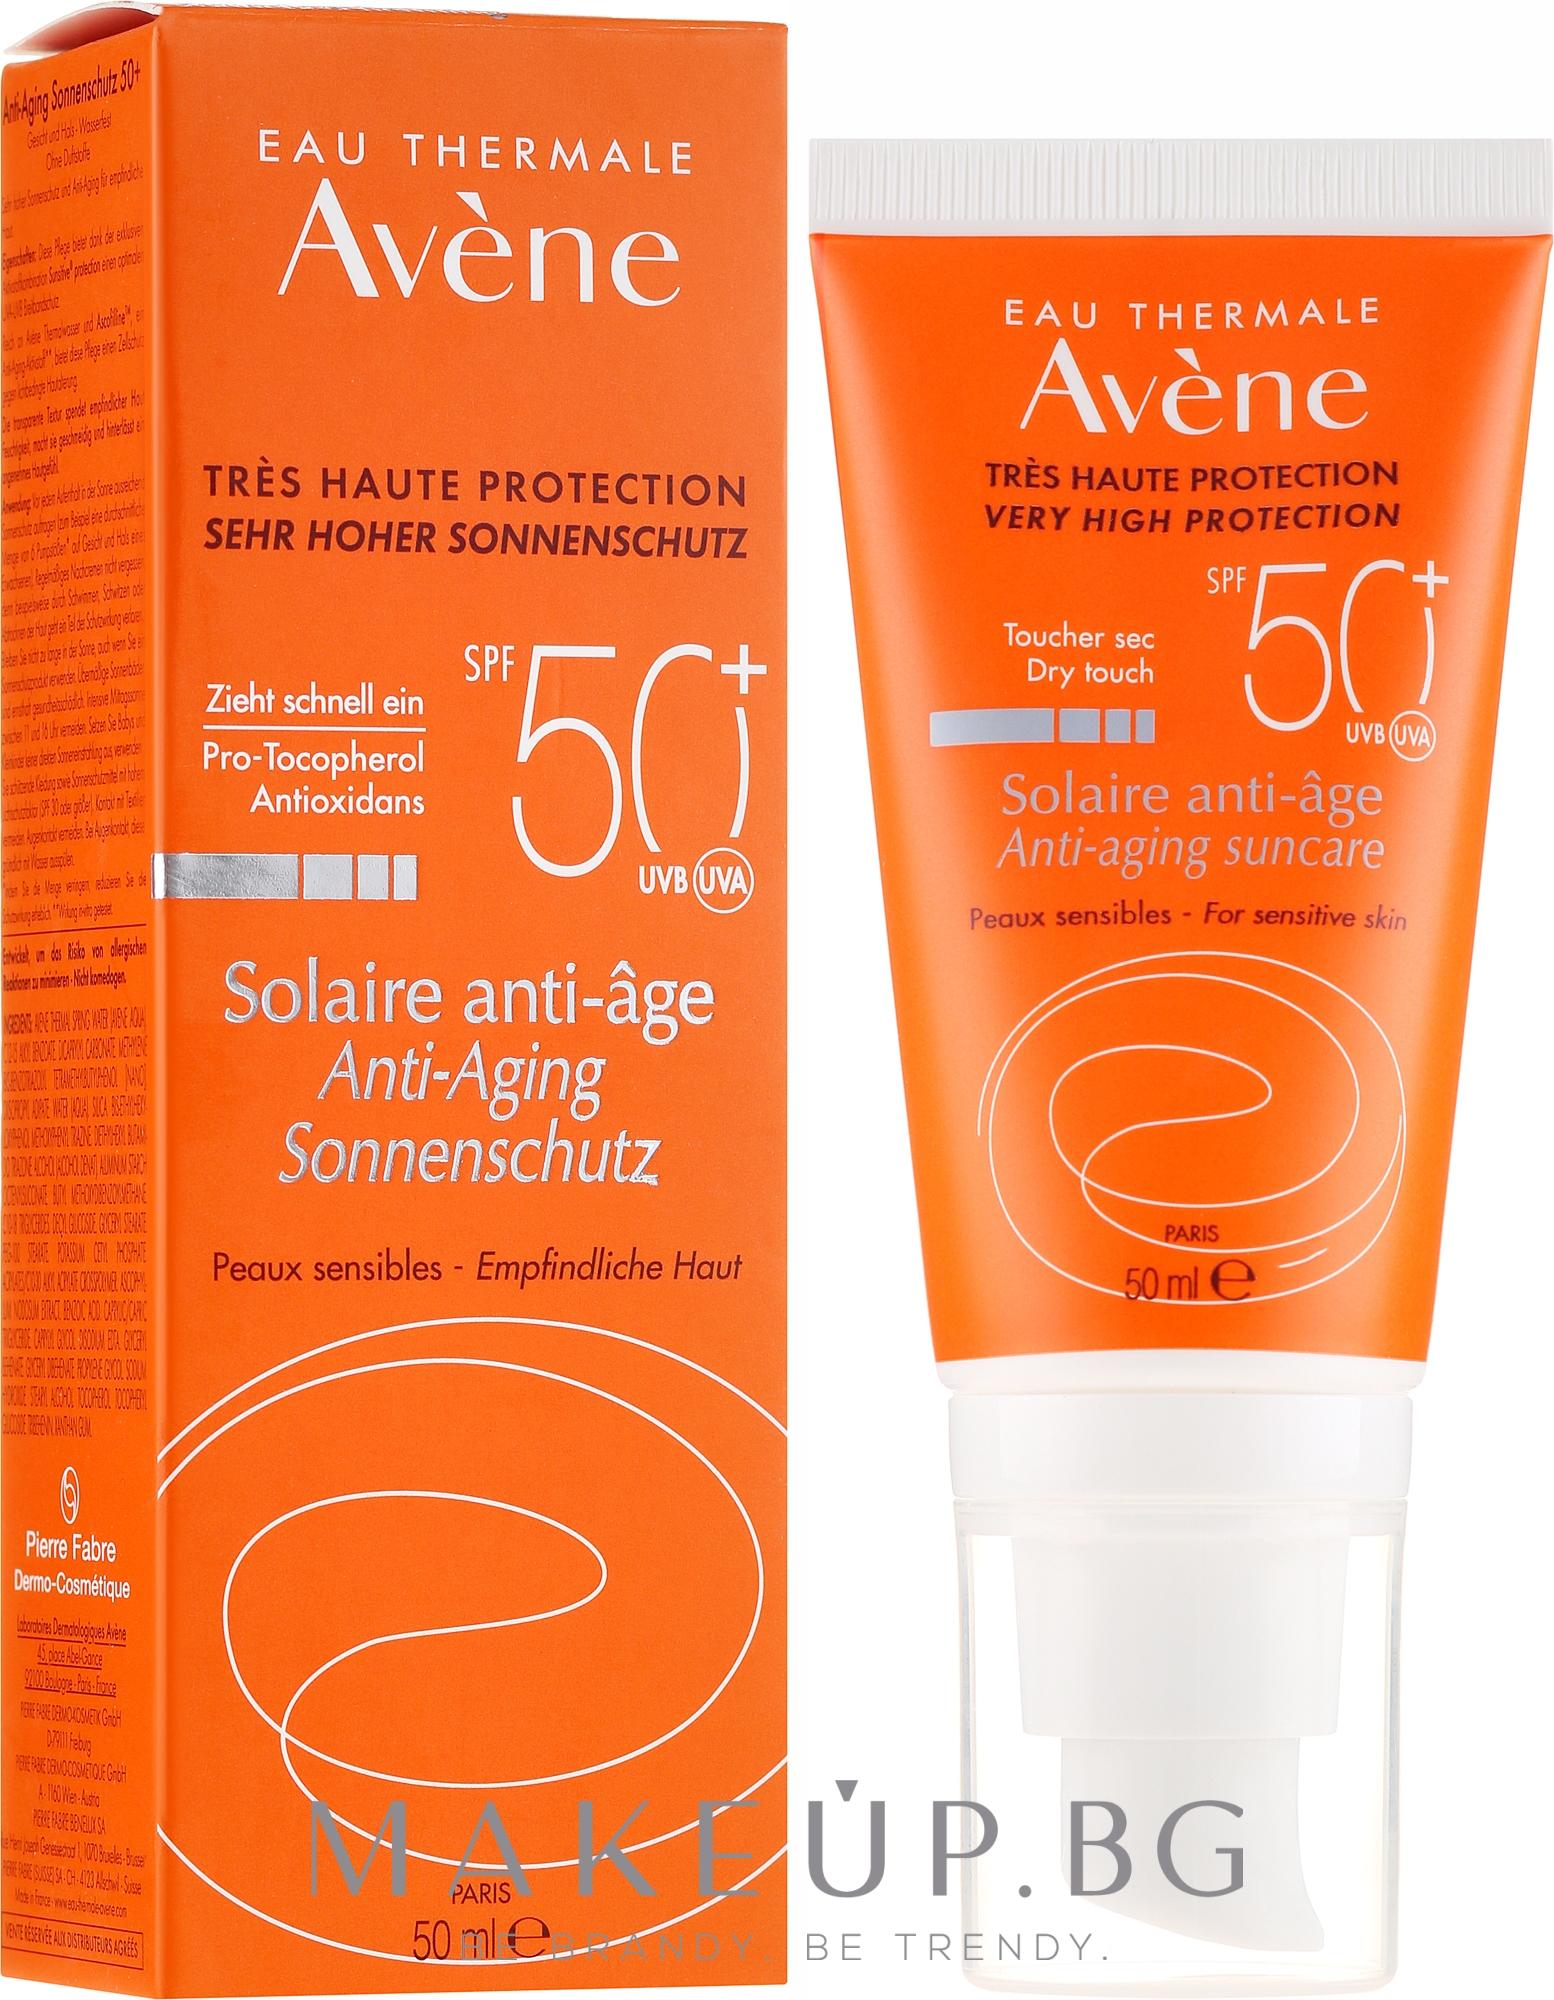 Avene Solaire Anti-Age SPF 50 + - Слънцезащитен крем за..